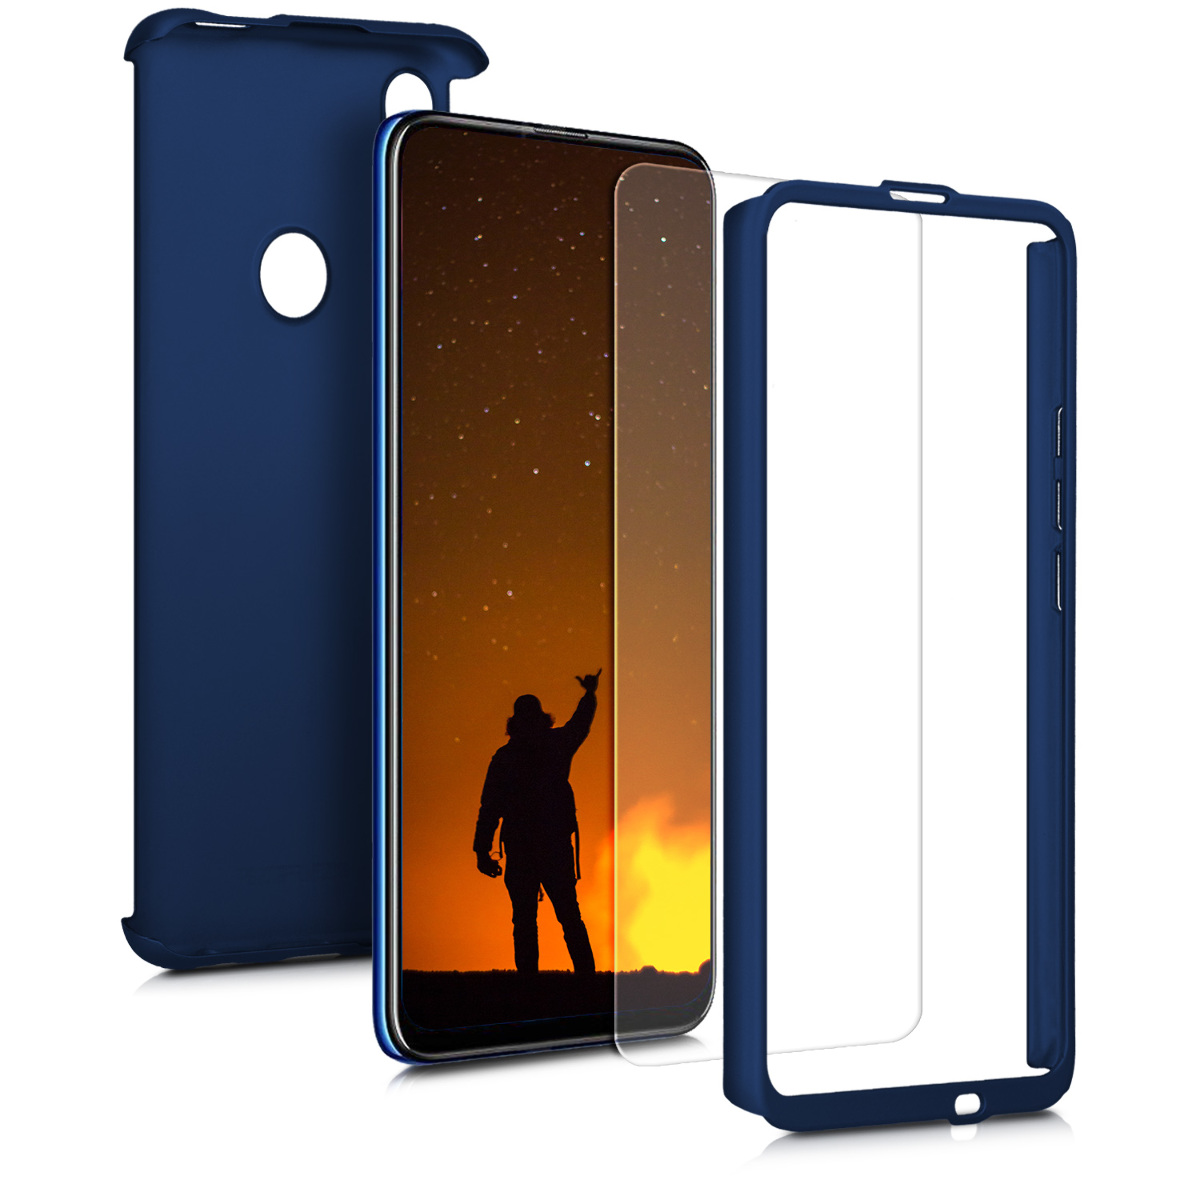 KW Full Body Θήκη Huawei P Smart Z & Tempered Glass - Metallic Blue (49367.64)